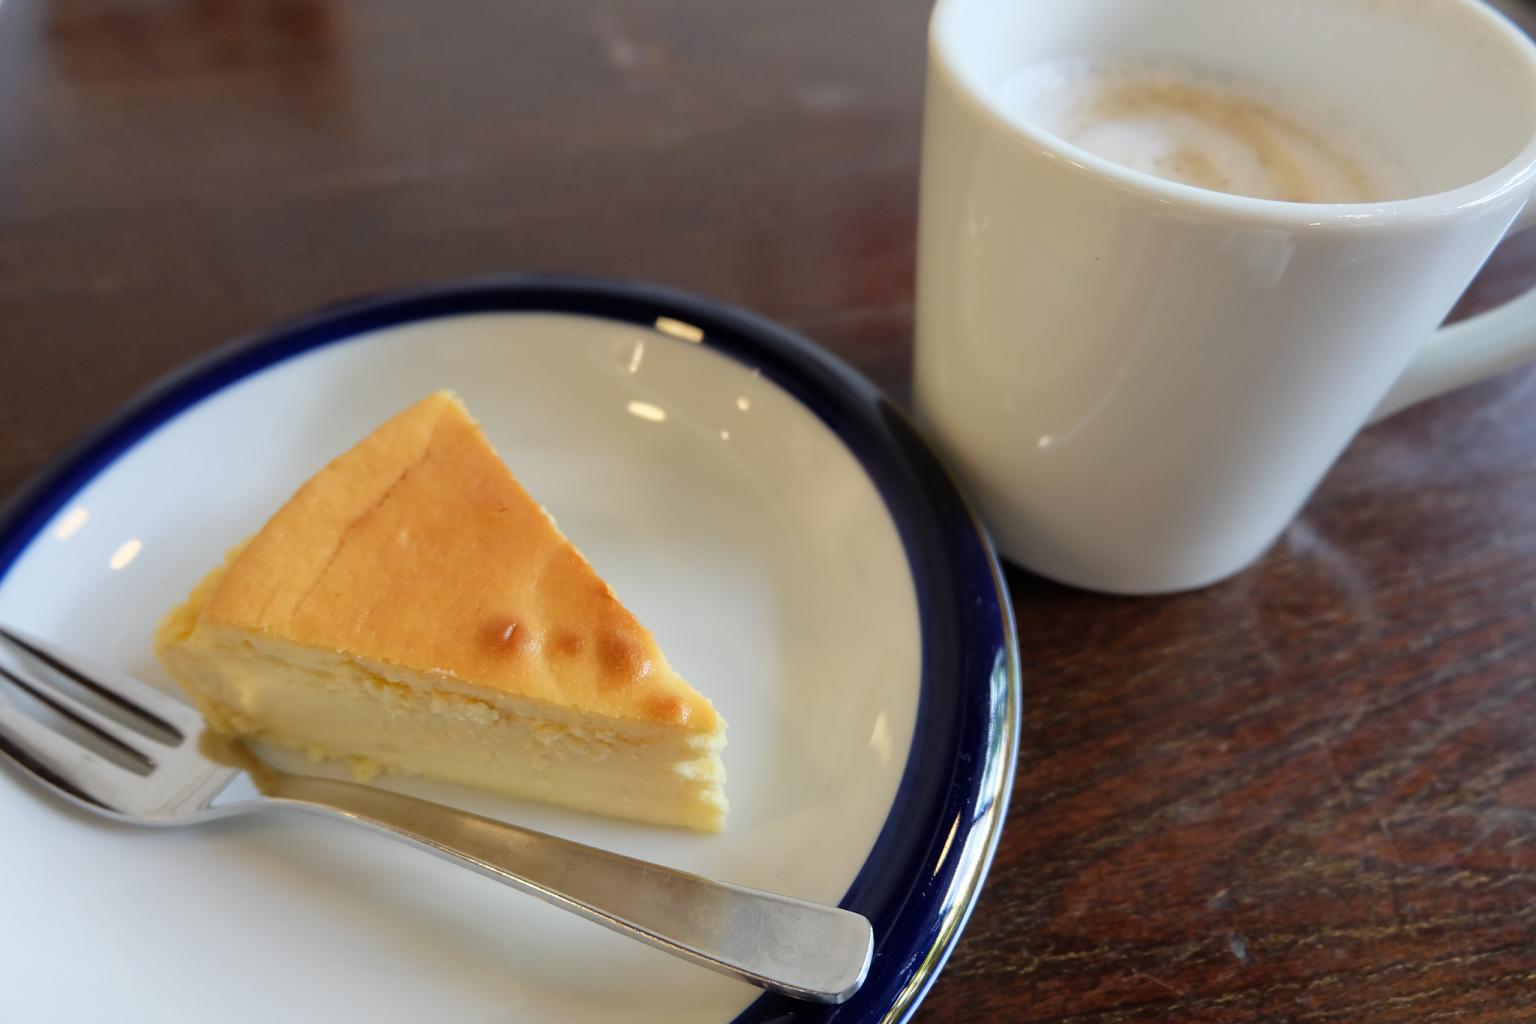 fukadaso cafe